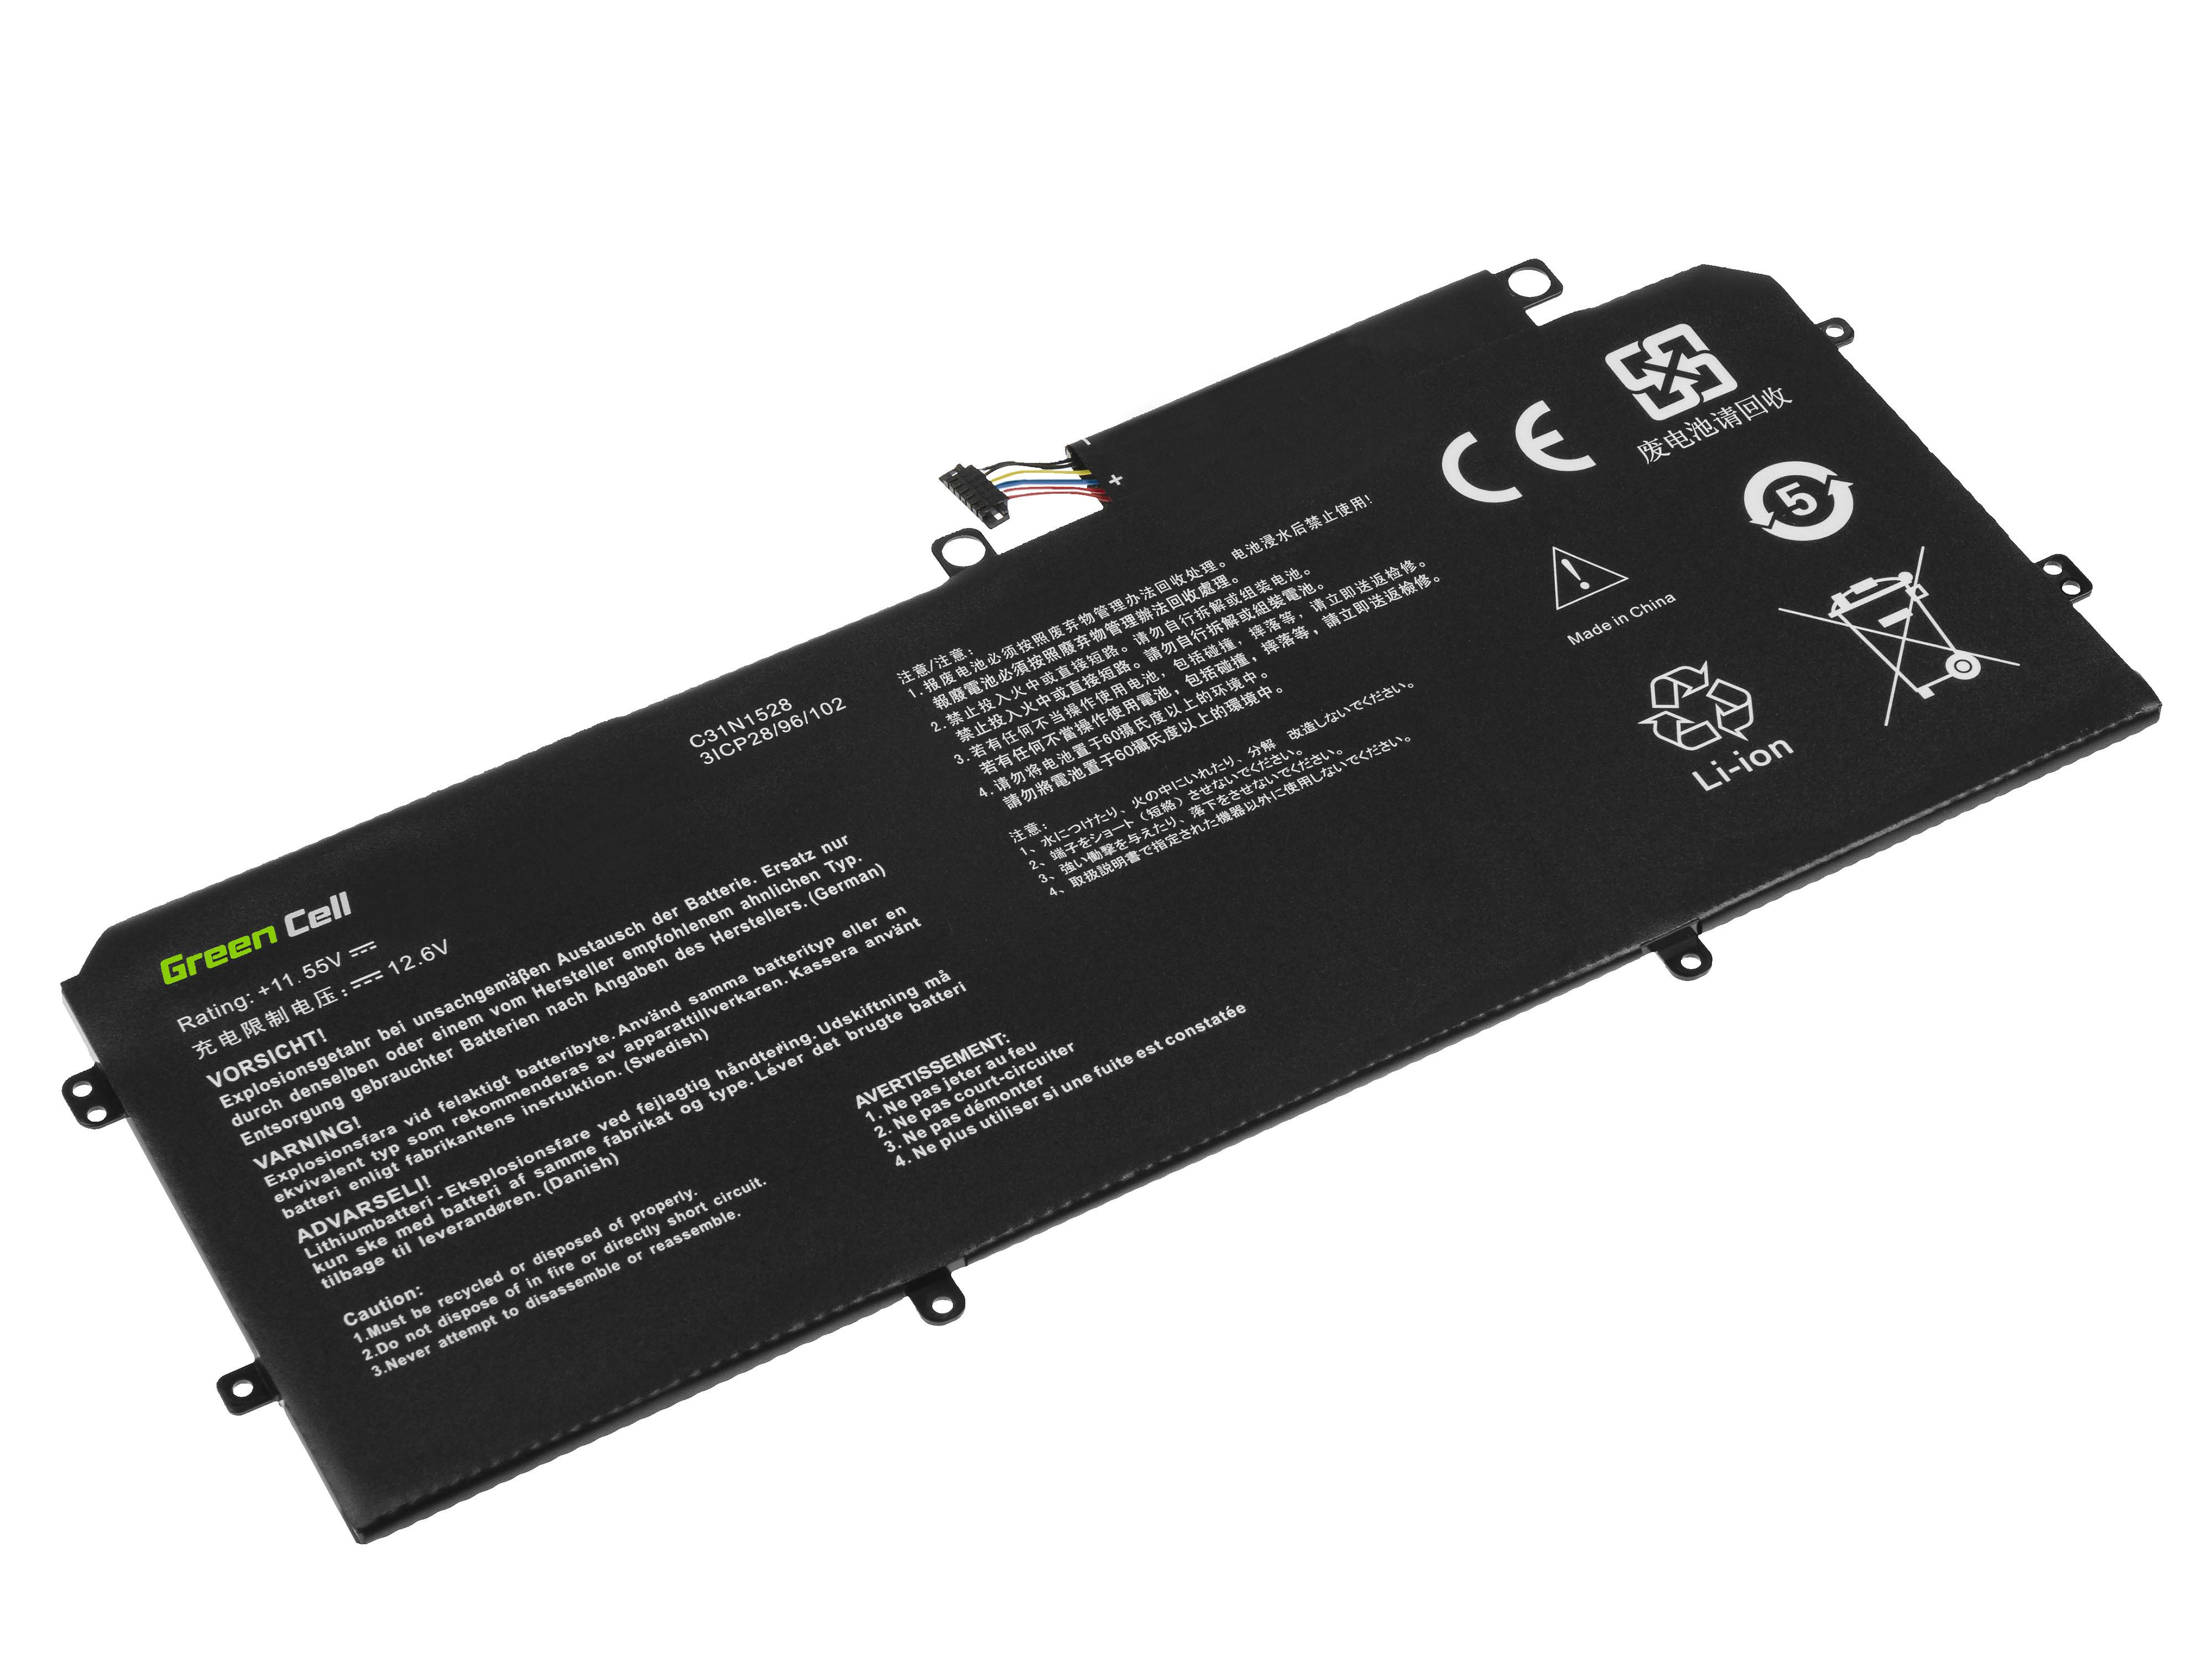 Green Cell AS152 Baterie Asus C31N1528 pro Asus ZenBook Flip UX360C UX360CA 3000mAh Li-Pol – neoriginální